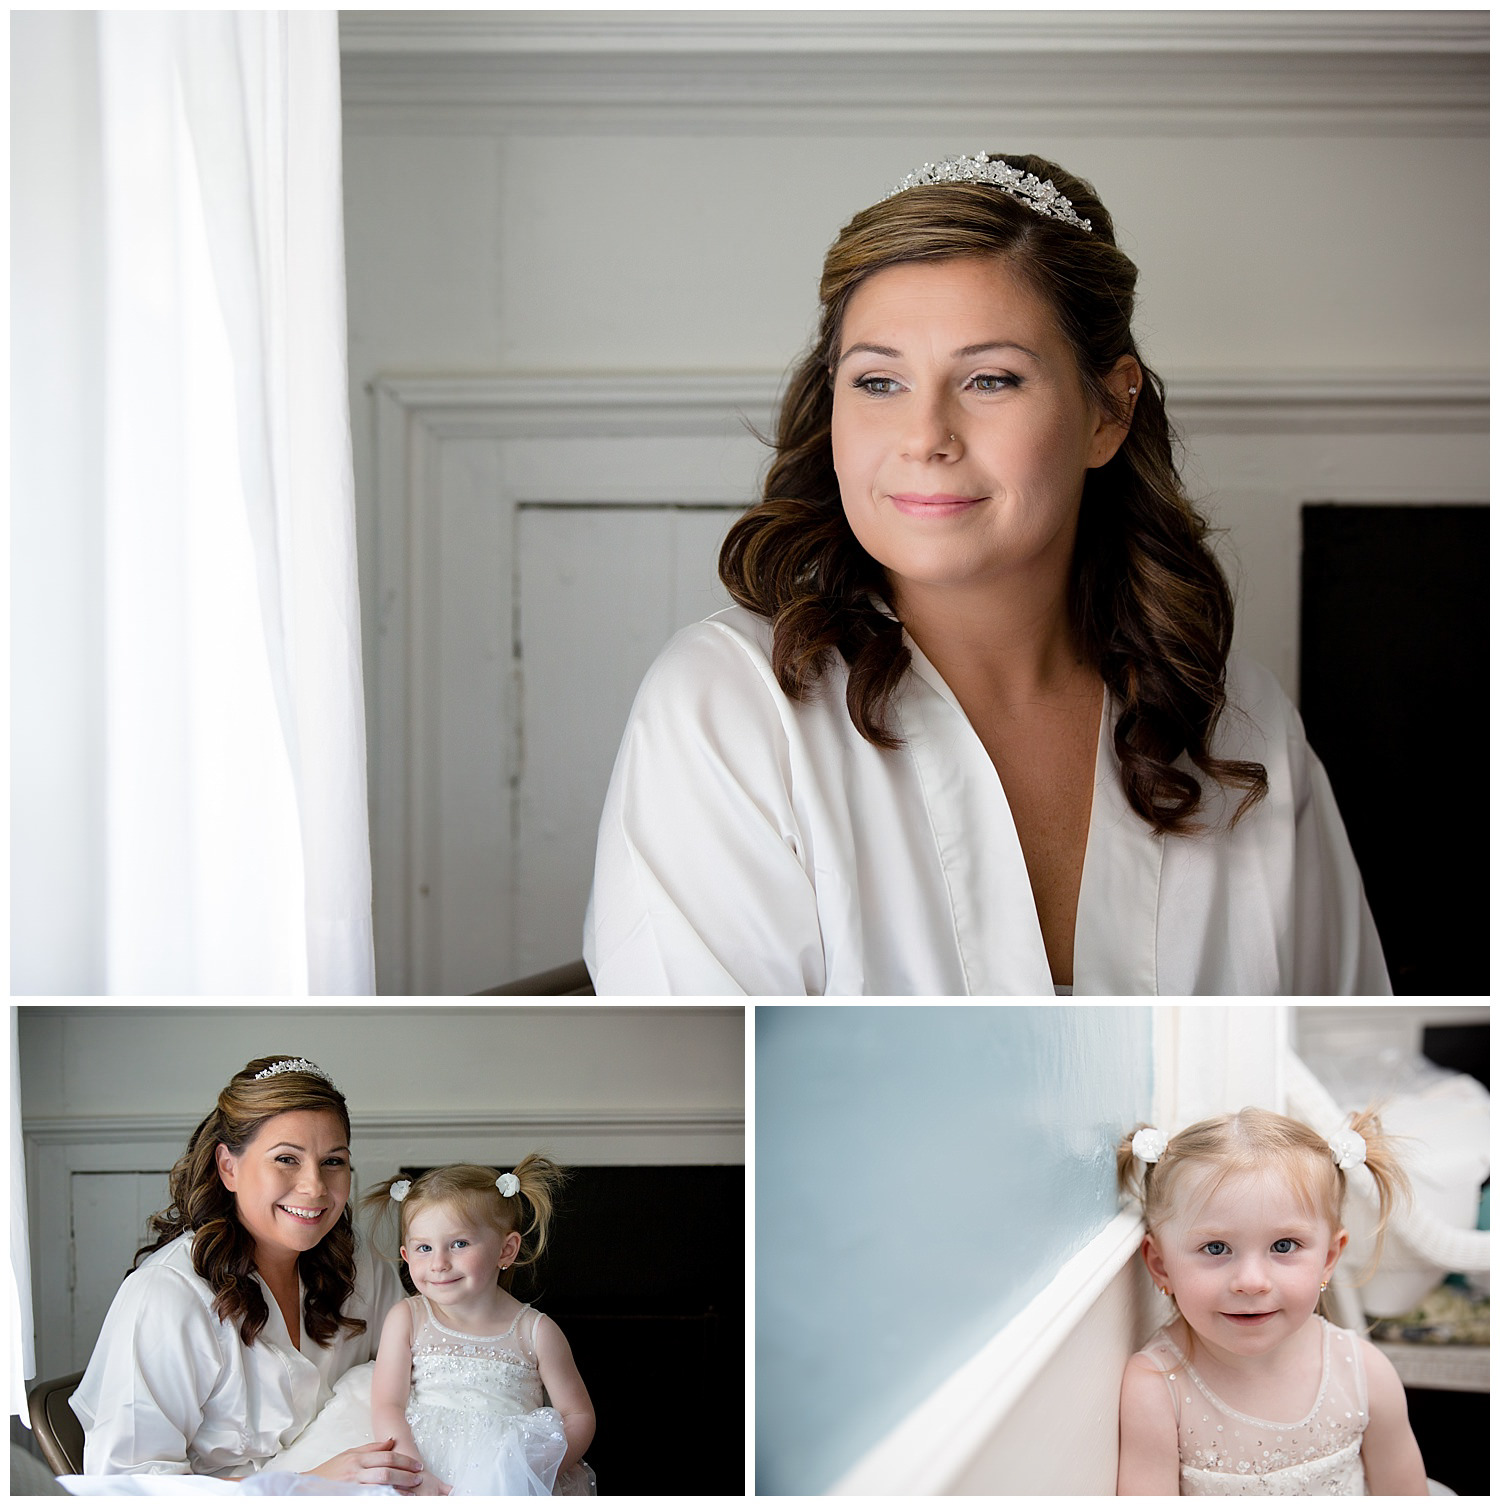 smith-barn-brooksby-farm-wedding-26-north-studios-boston-wedding-photographer-008.jpg